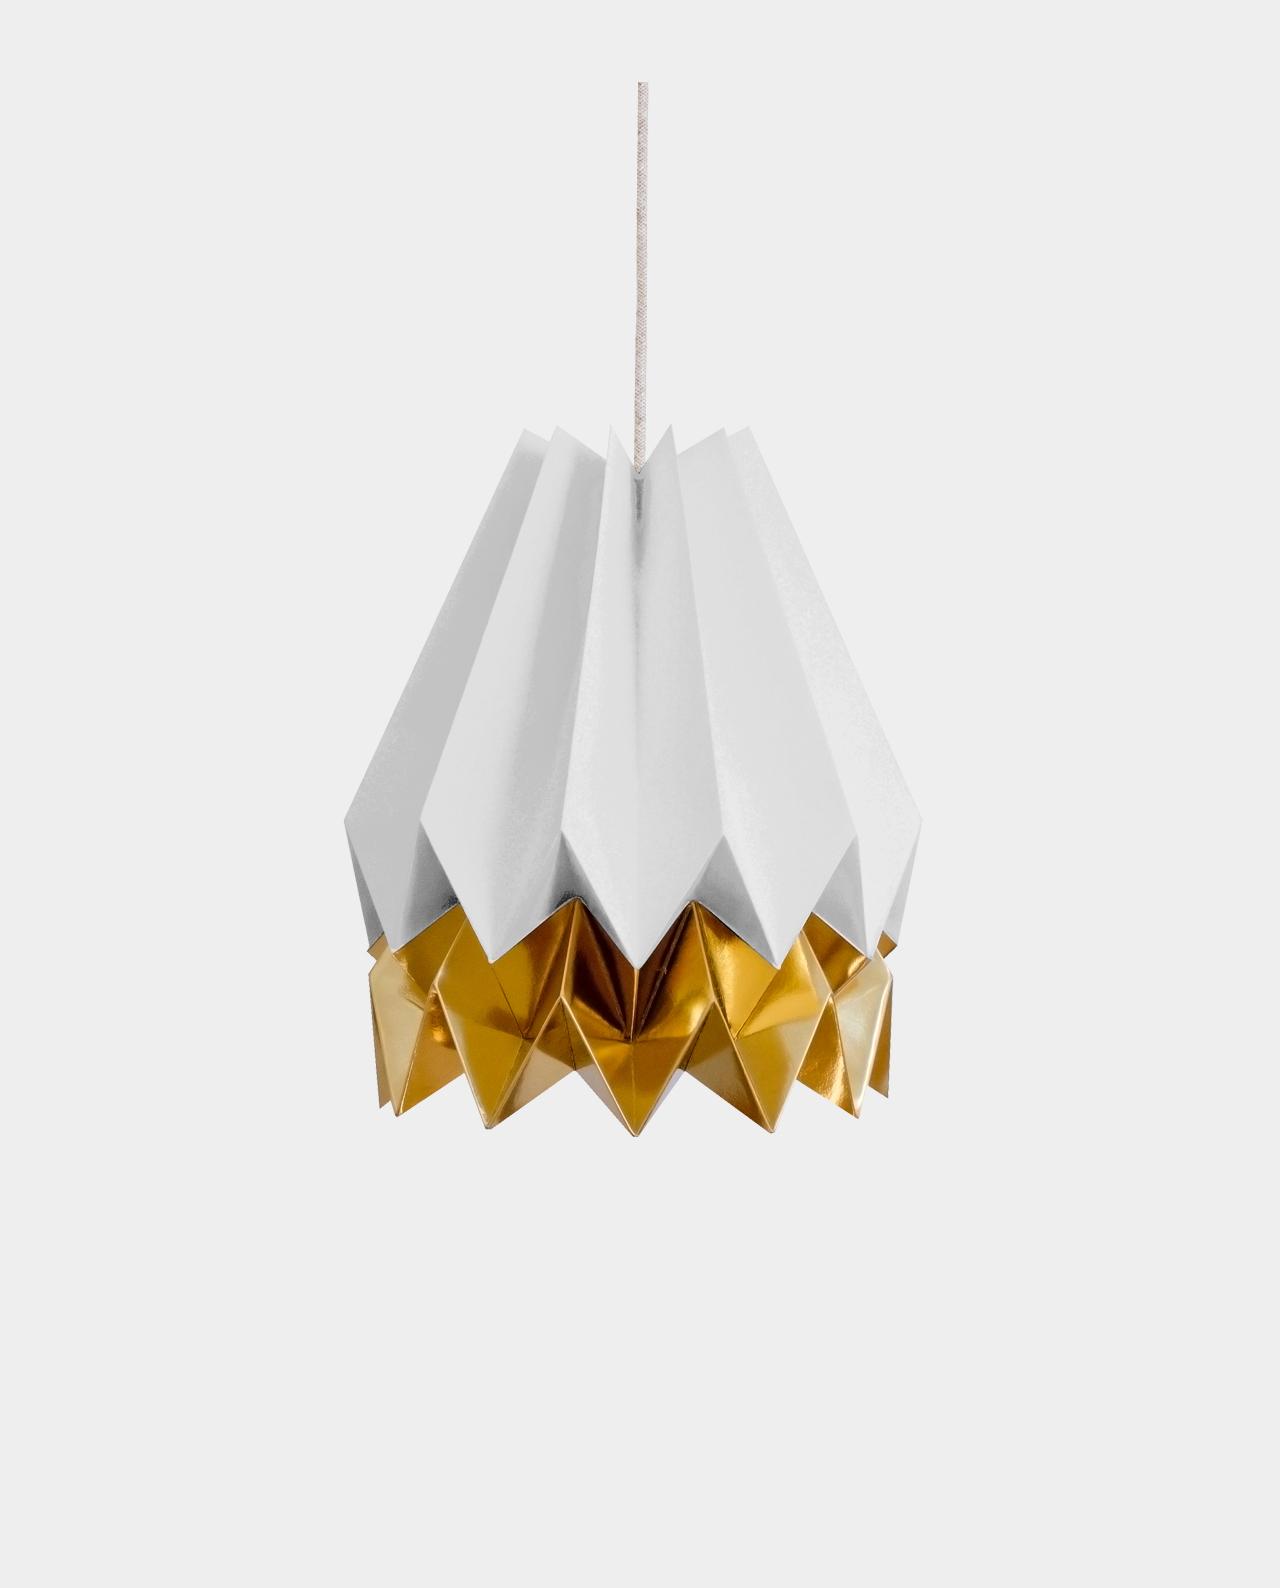 papierlampe barra grey jetzt online kaufen. Black Bedroom Furniture Sets. Home Design Ideas